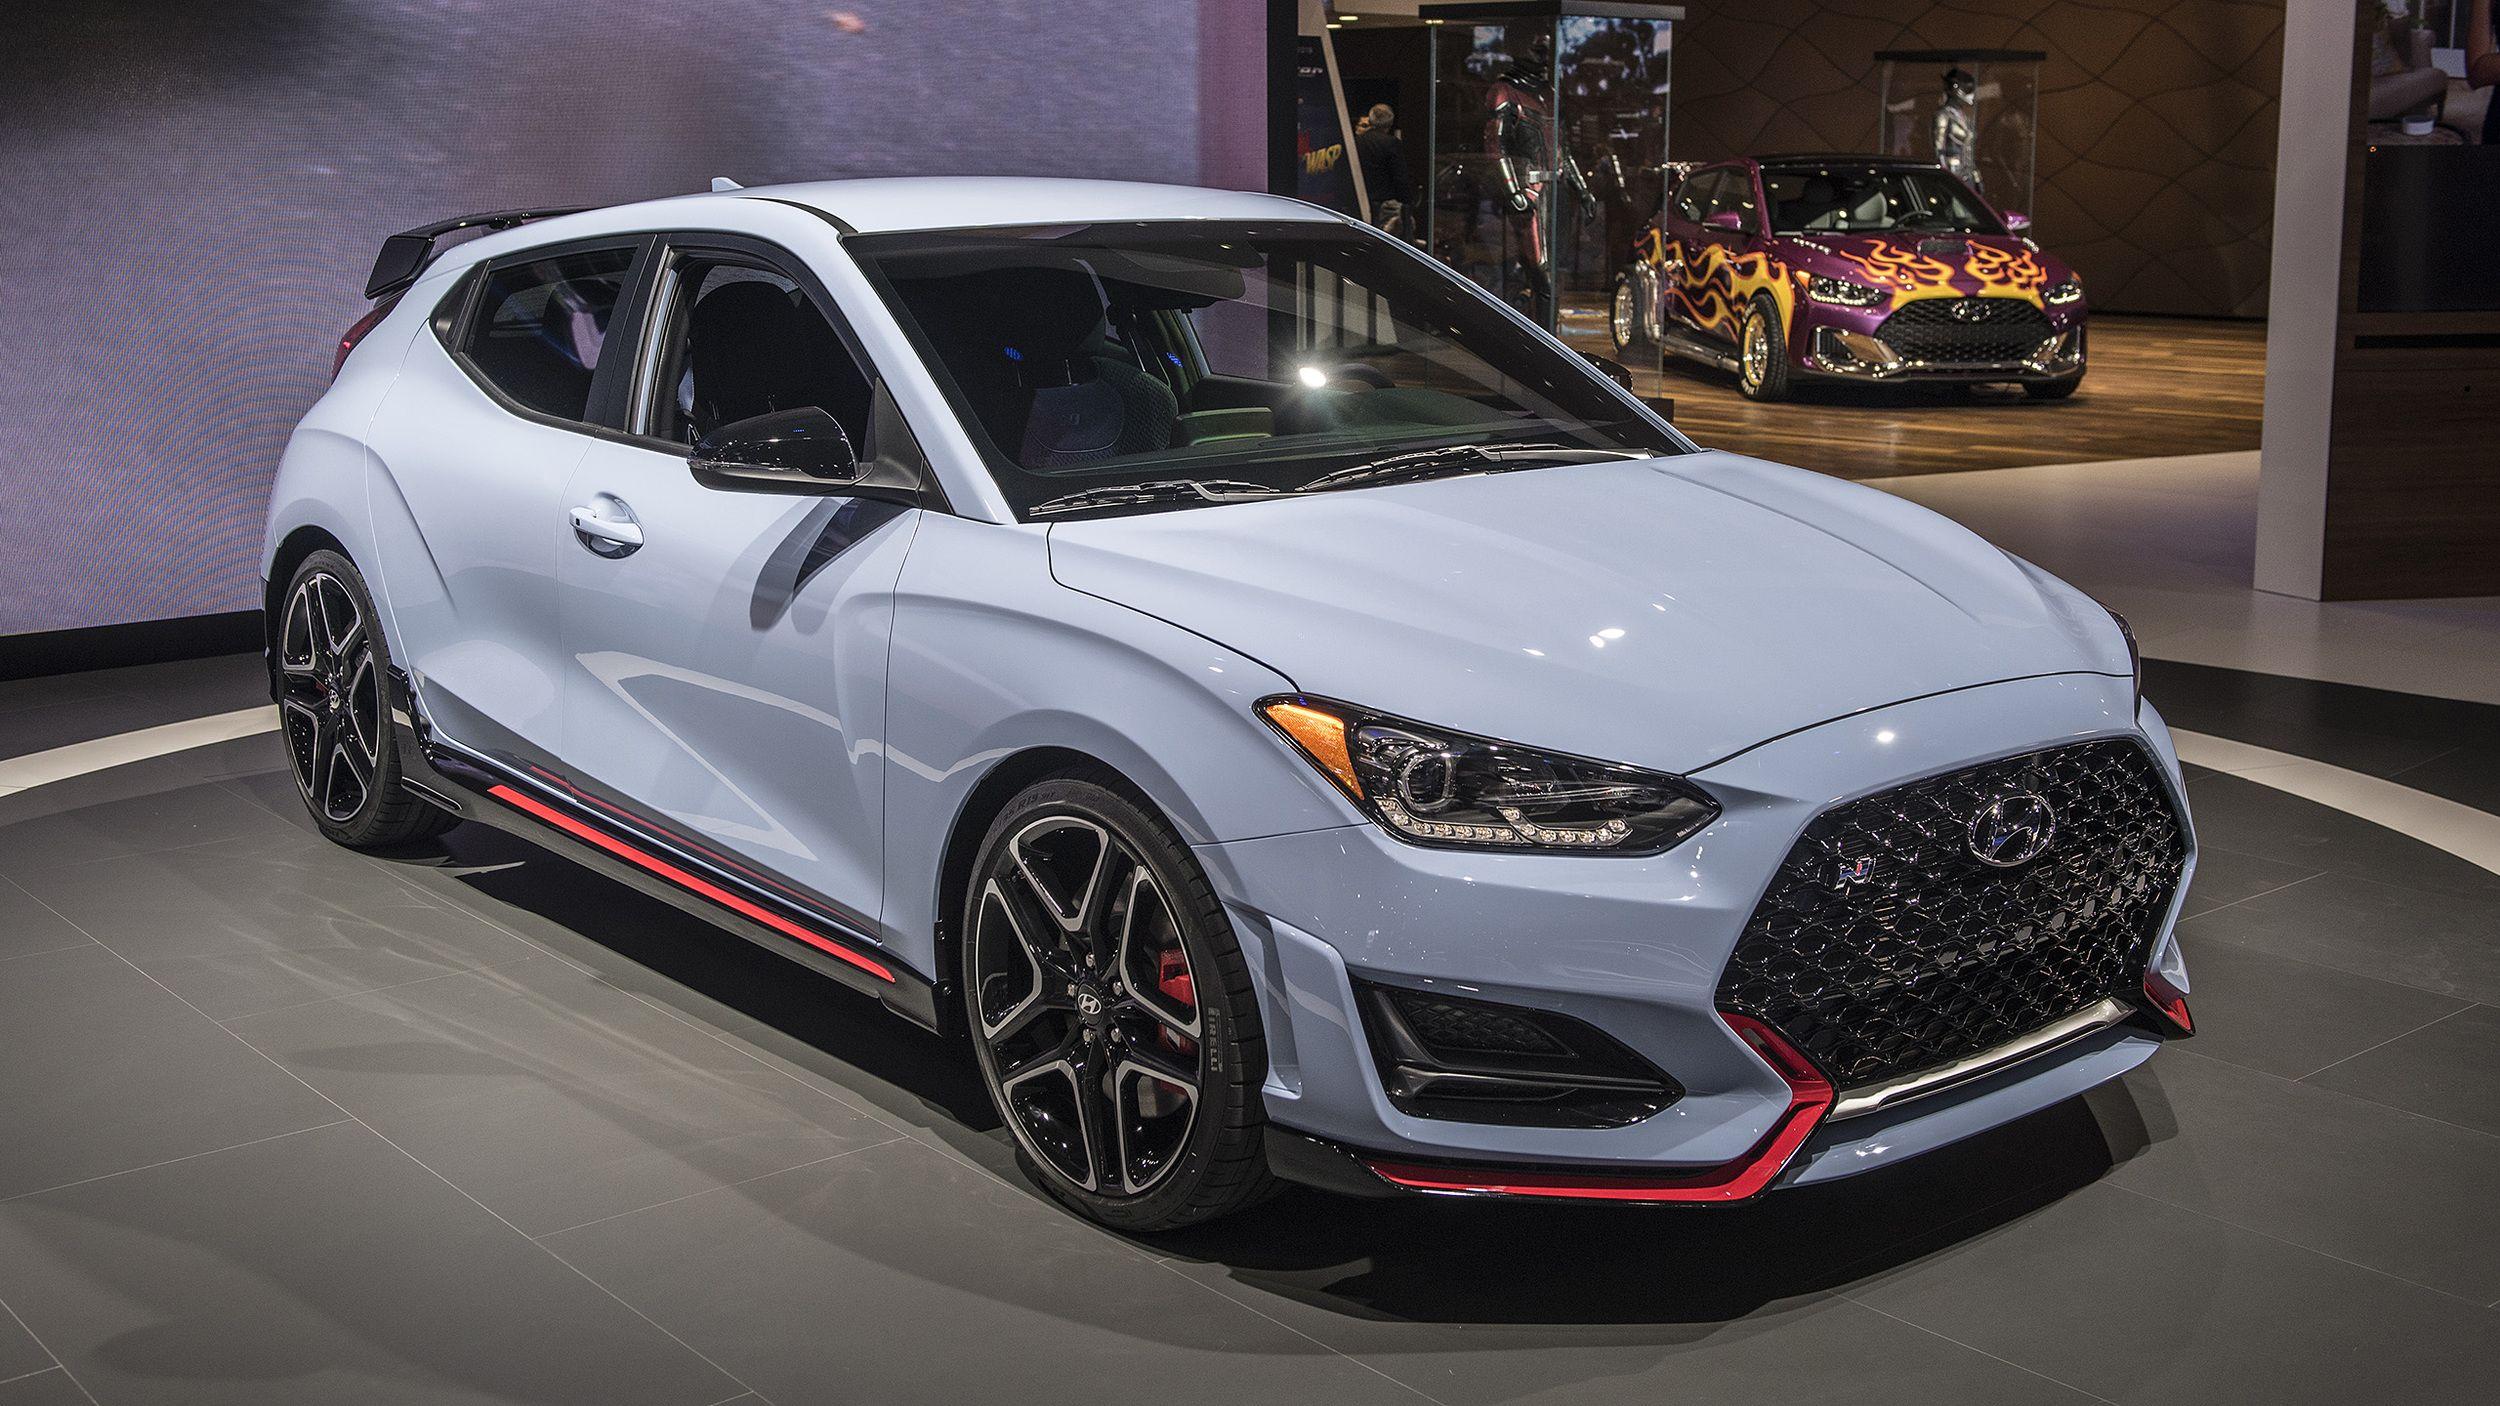 2019 Hyundai Veloster N | Automobiles | Hyundai cars, Hyundai